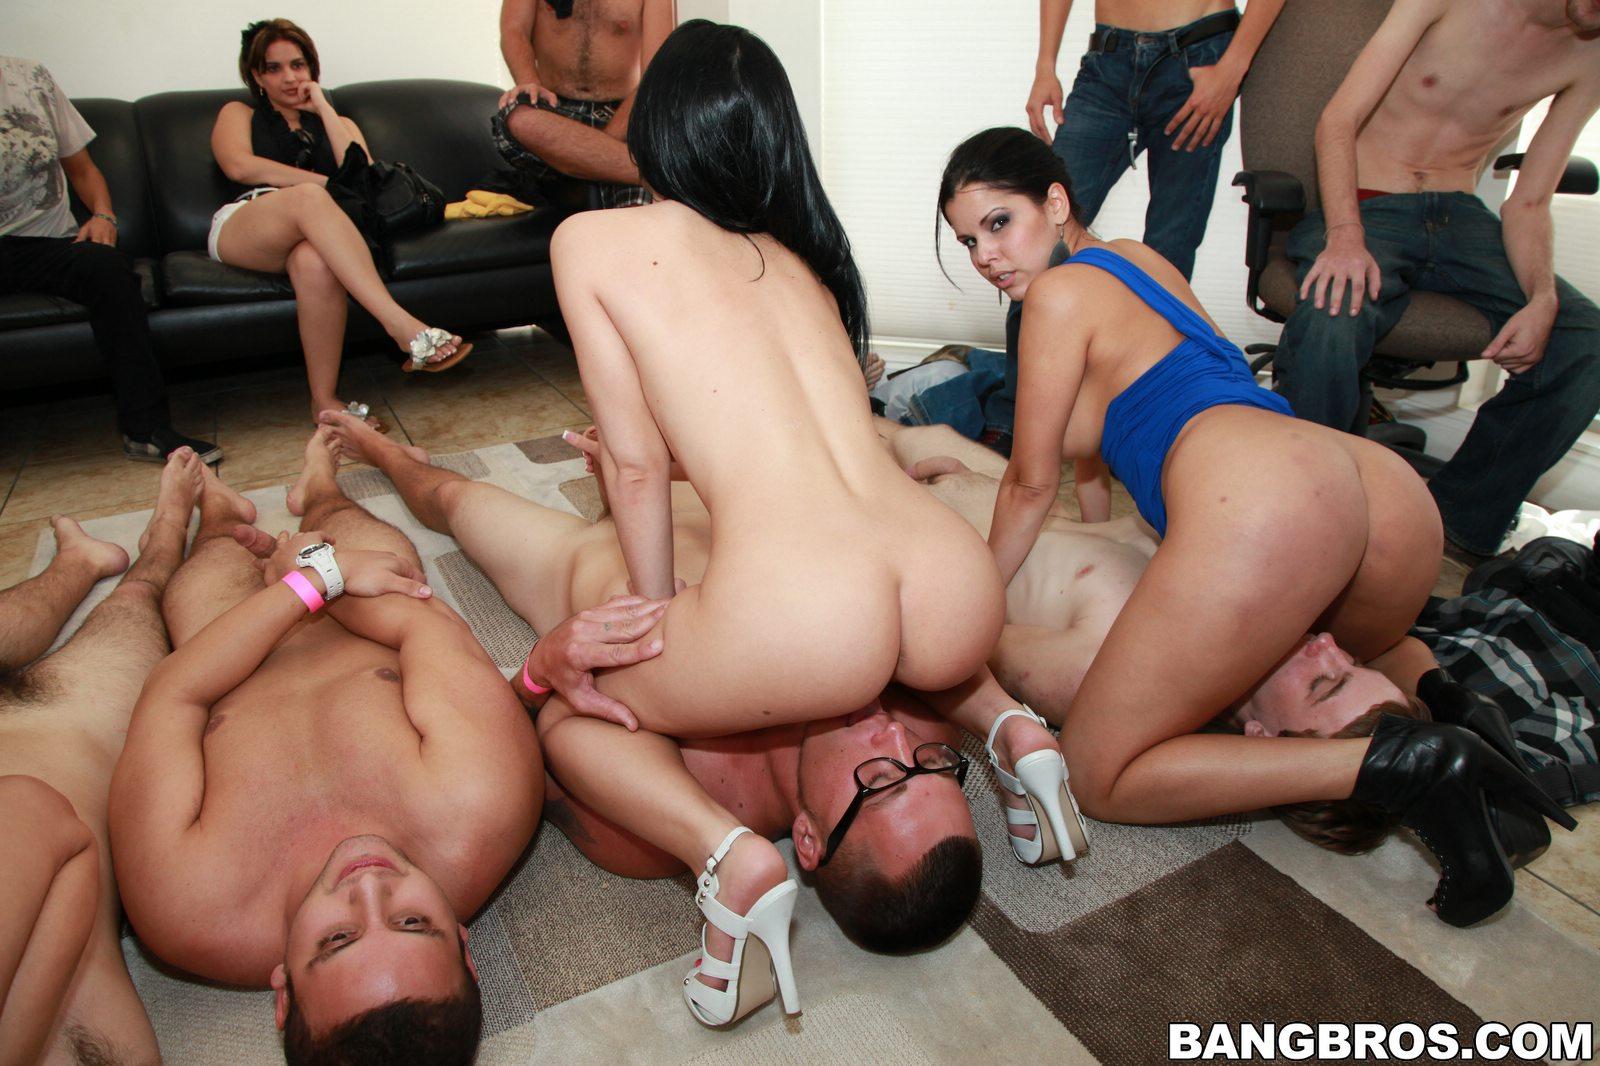 Фото секса со шлюхами 11 фотография